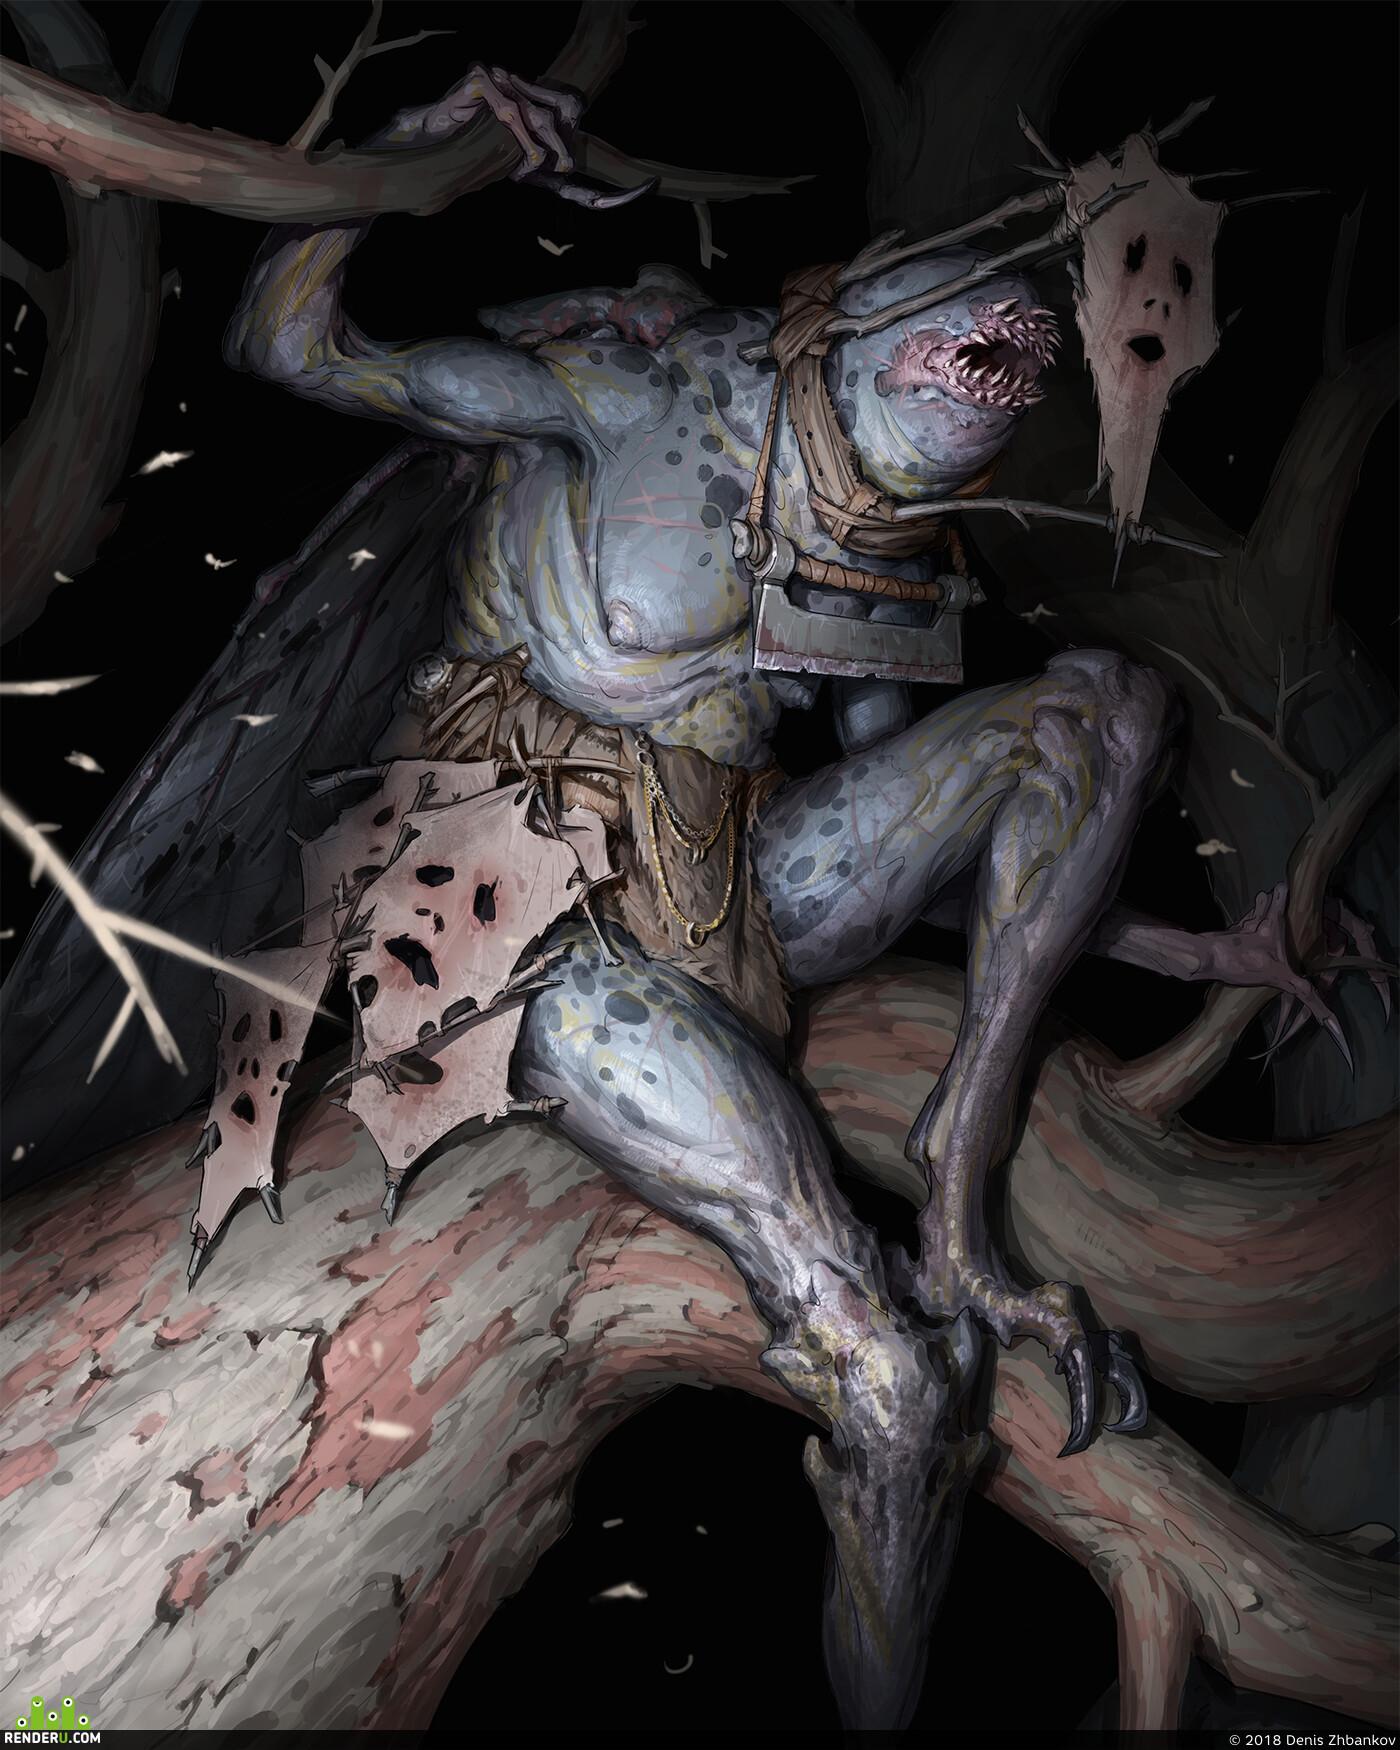 creatures, Characters, Horror